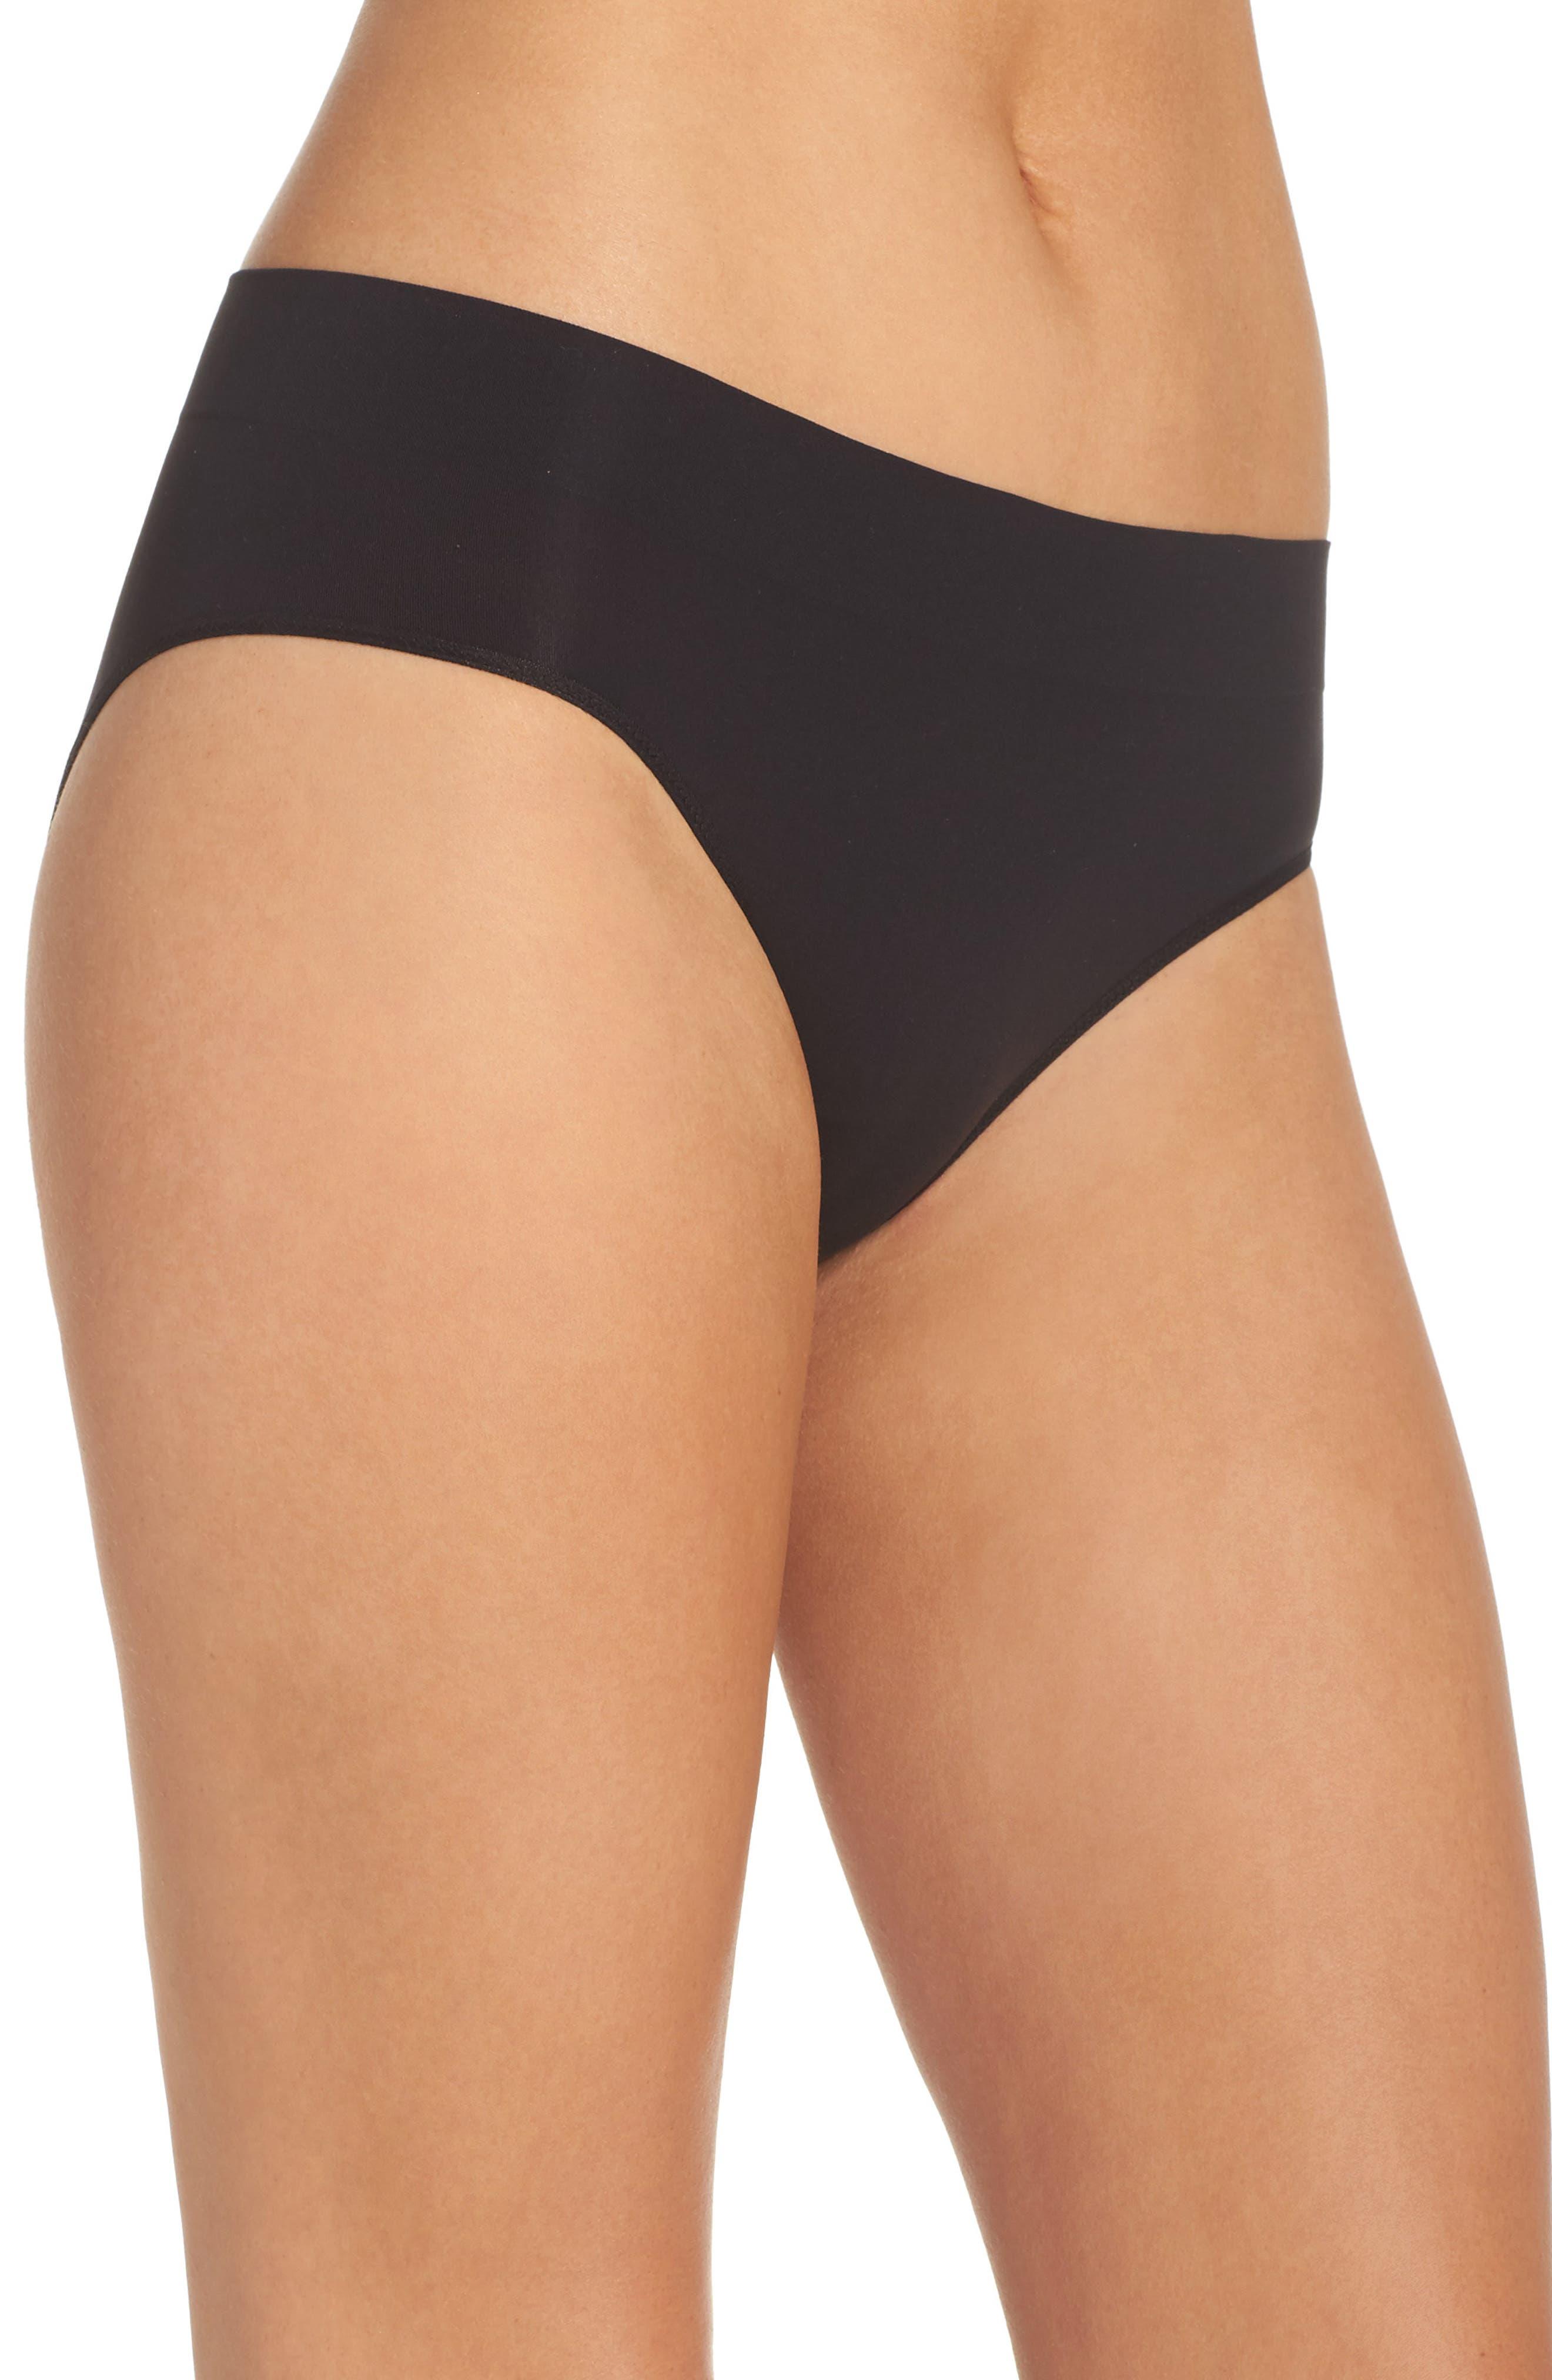 Alternate Image 3  - DKNY LiteWear Seamless Bikini (3 for $33)